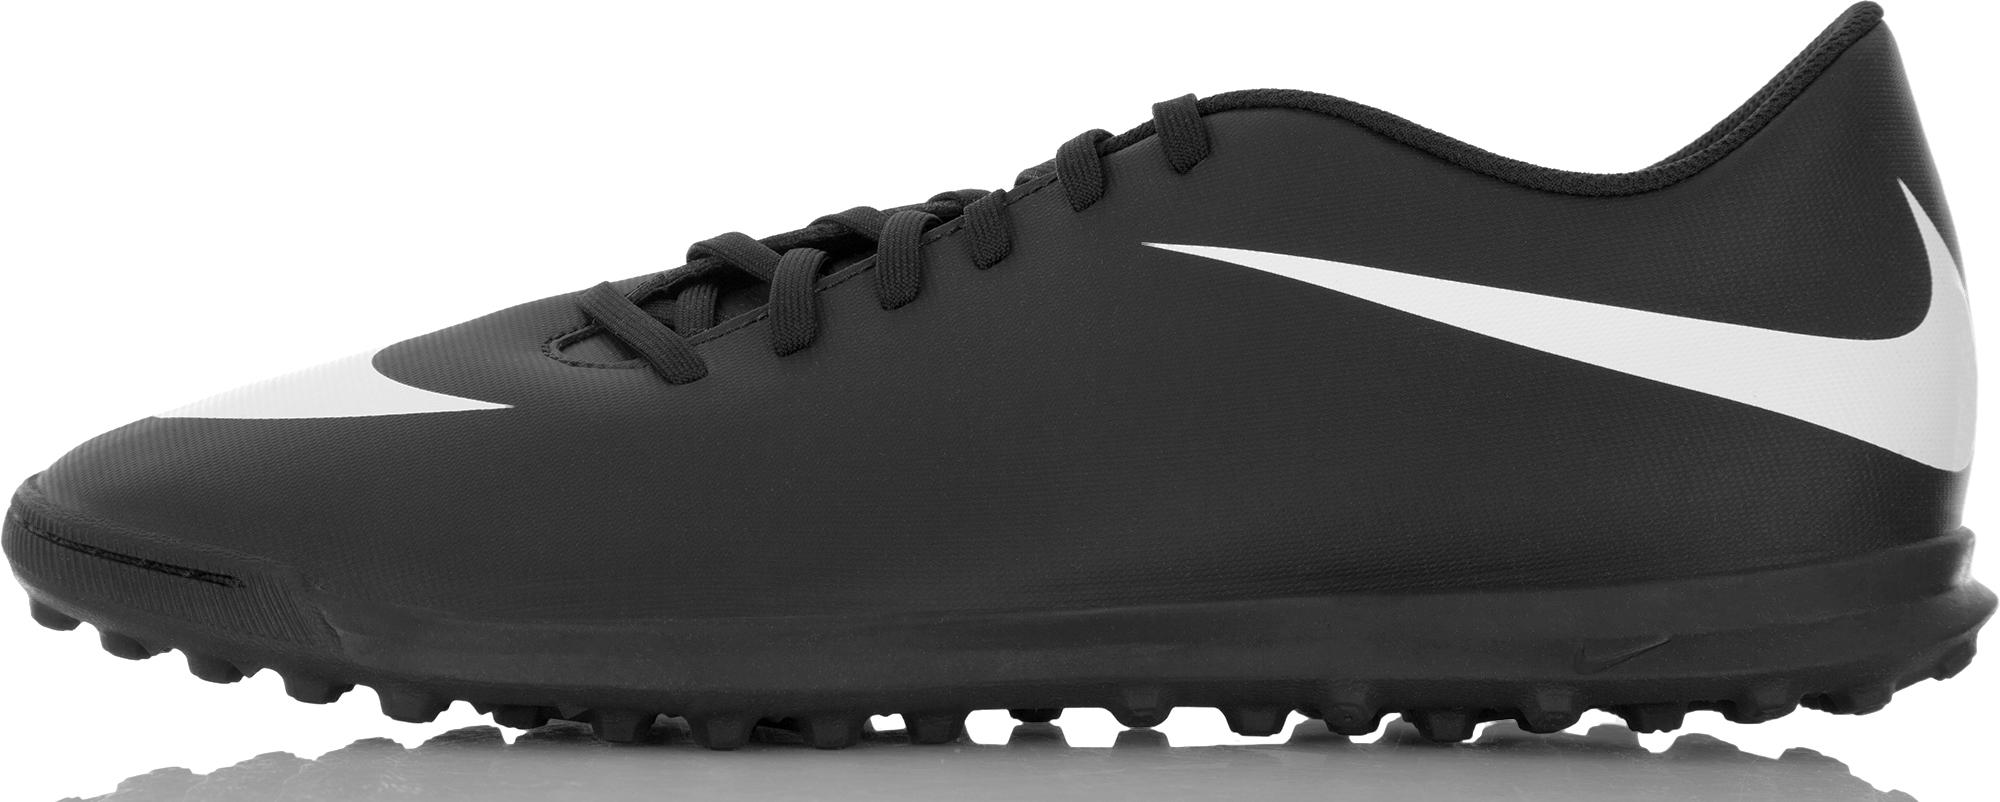 Nike Бутсы мужские Nike BravataX II TF бутсы футбольные минск nike t90